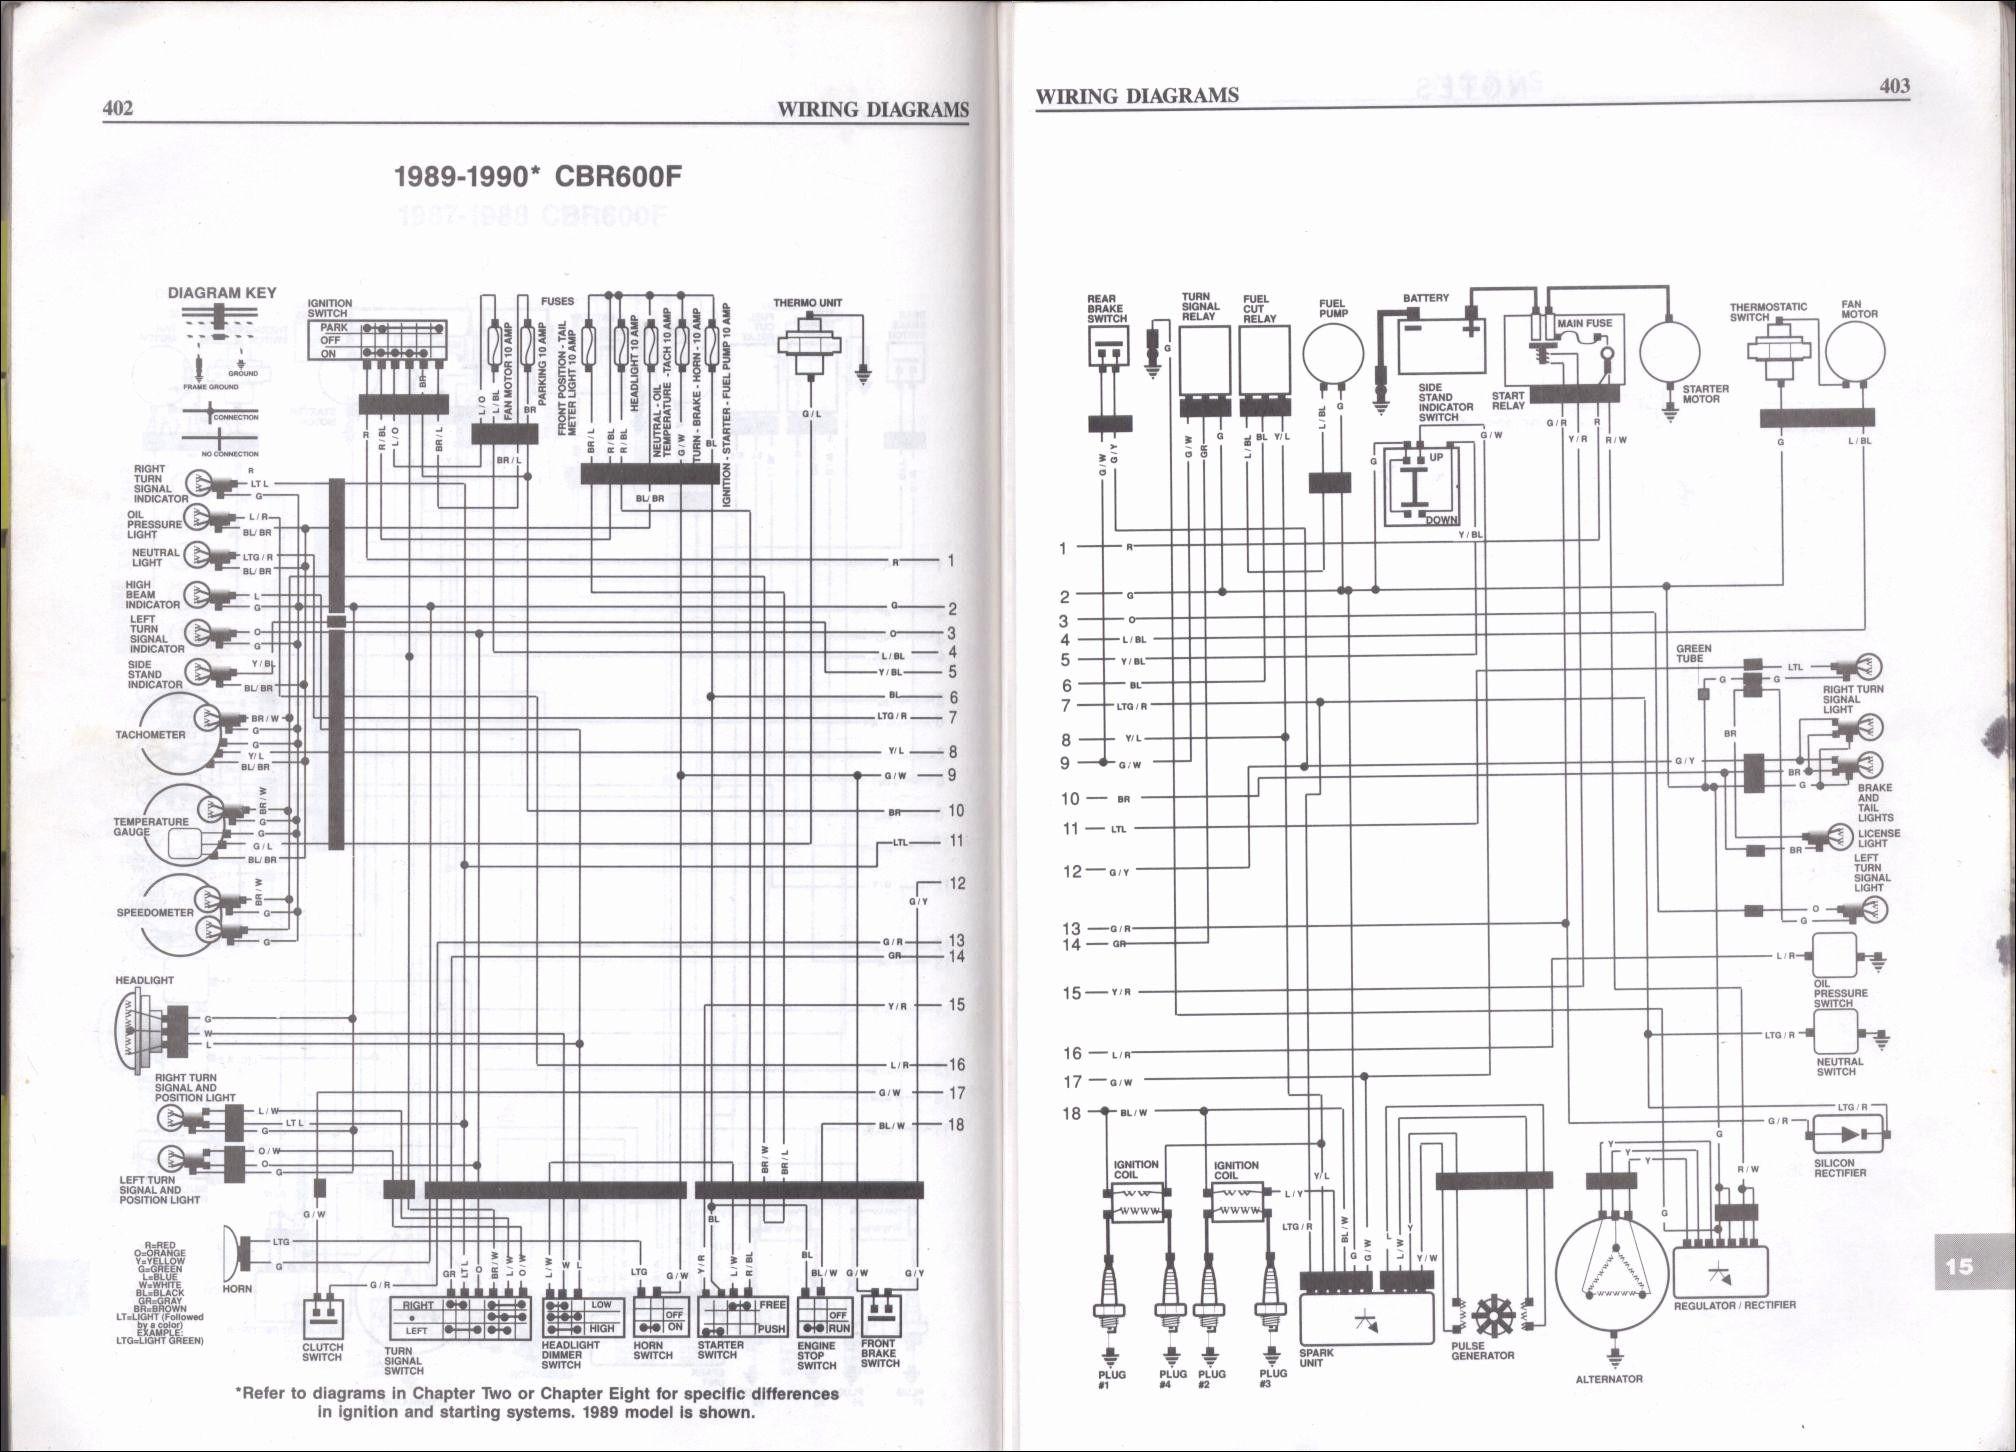 2003 Chevy Trailblazer Single Light Wire Diagram Honda C70 Wiring Diagram Auto Electrical Wiring Diagram Of 2003 Chevy Trailblazer Single Light Wire Diagram